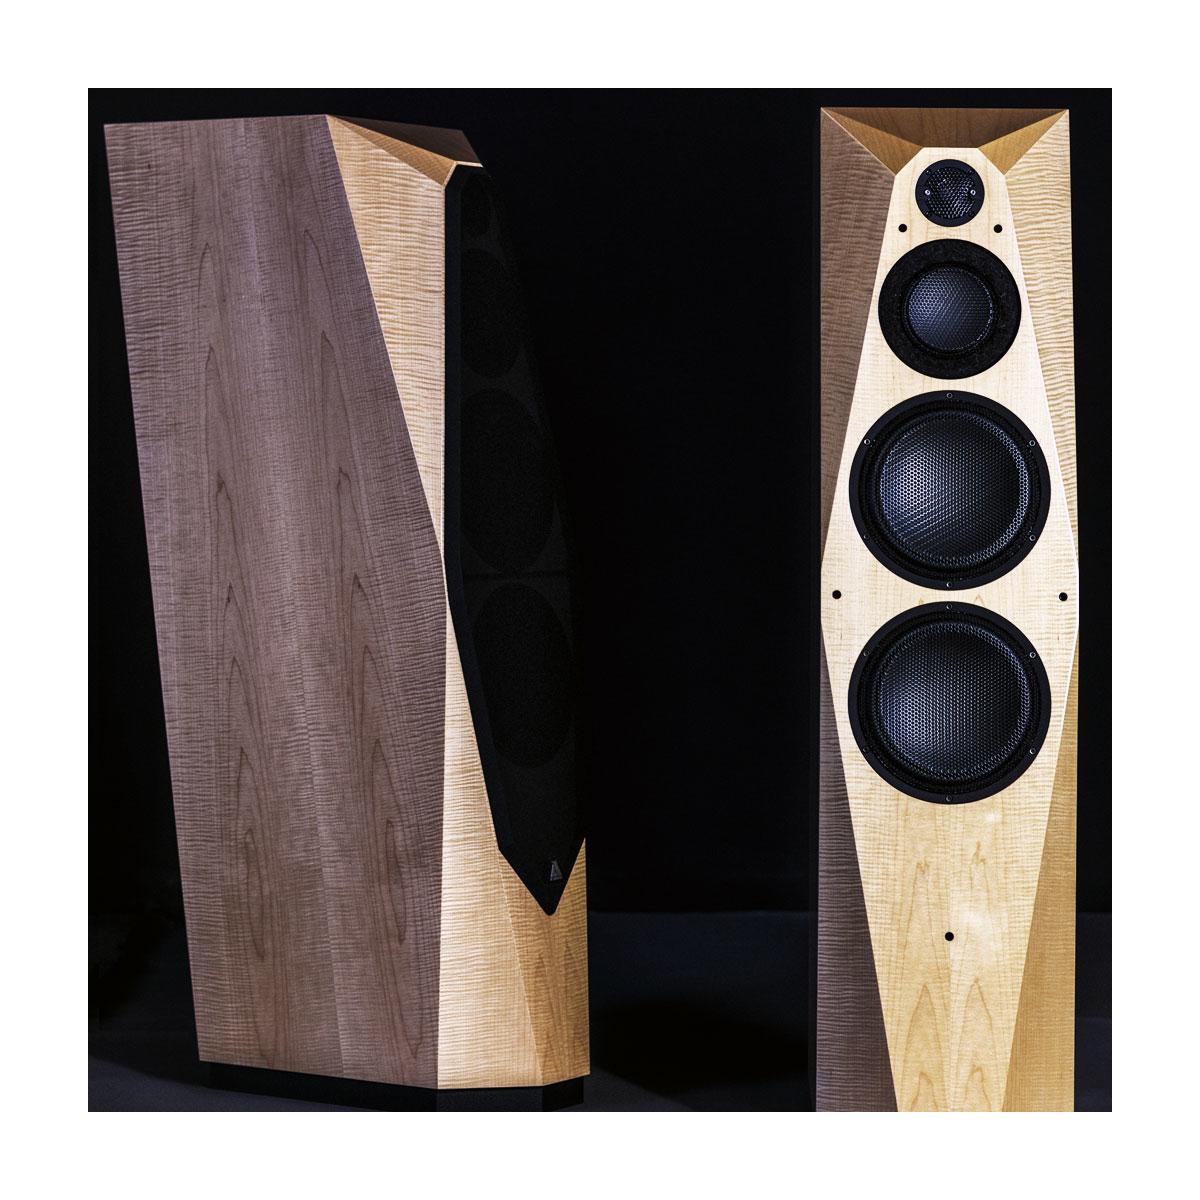 Avalon Acoustics Compas Diamonda Cherry 特別価格ASK! アヴァロン スピーカーシステム ペア